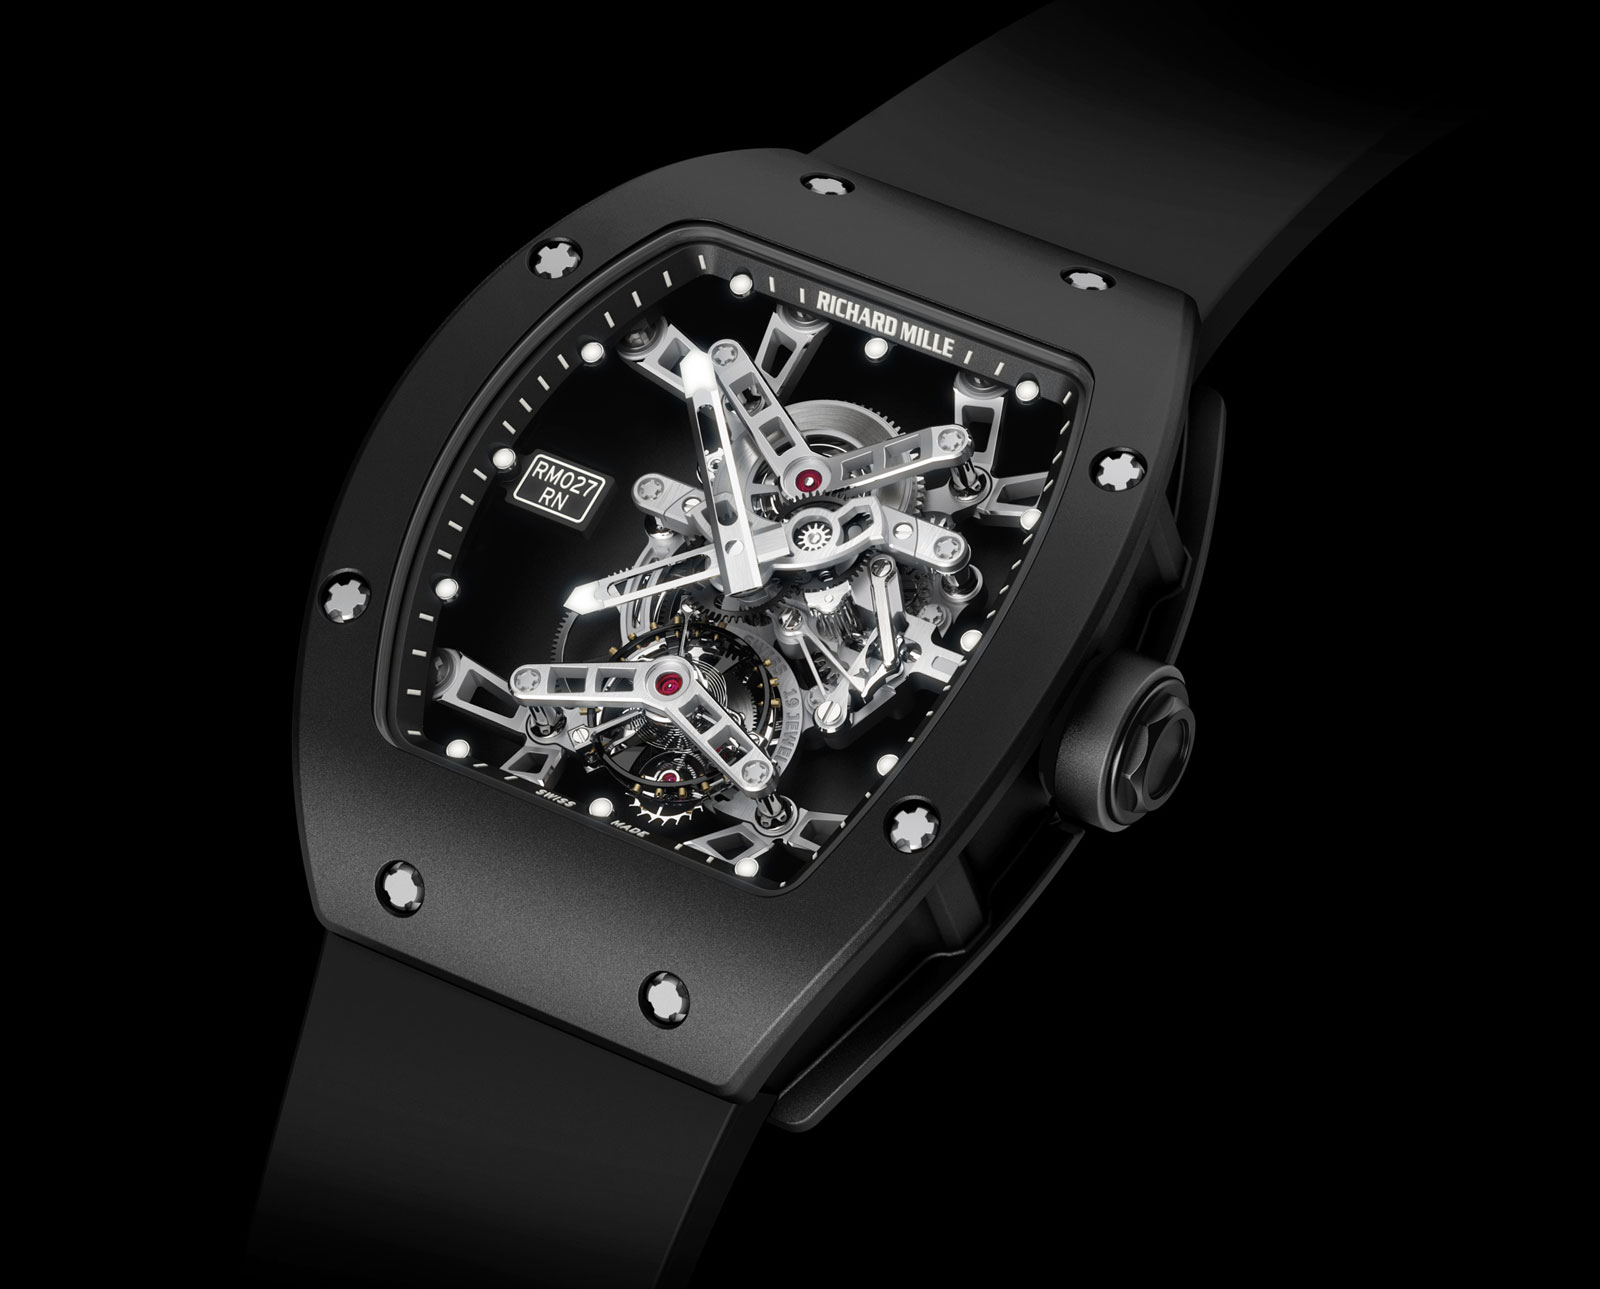 Rafael Nadal's Richard Mille RM027 Watch